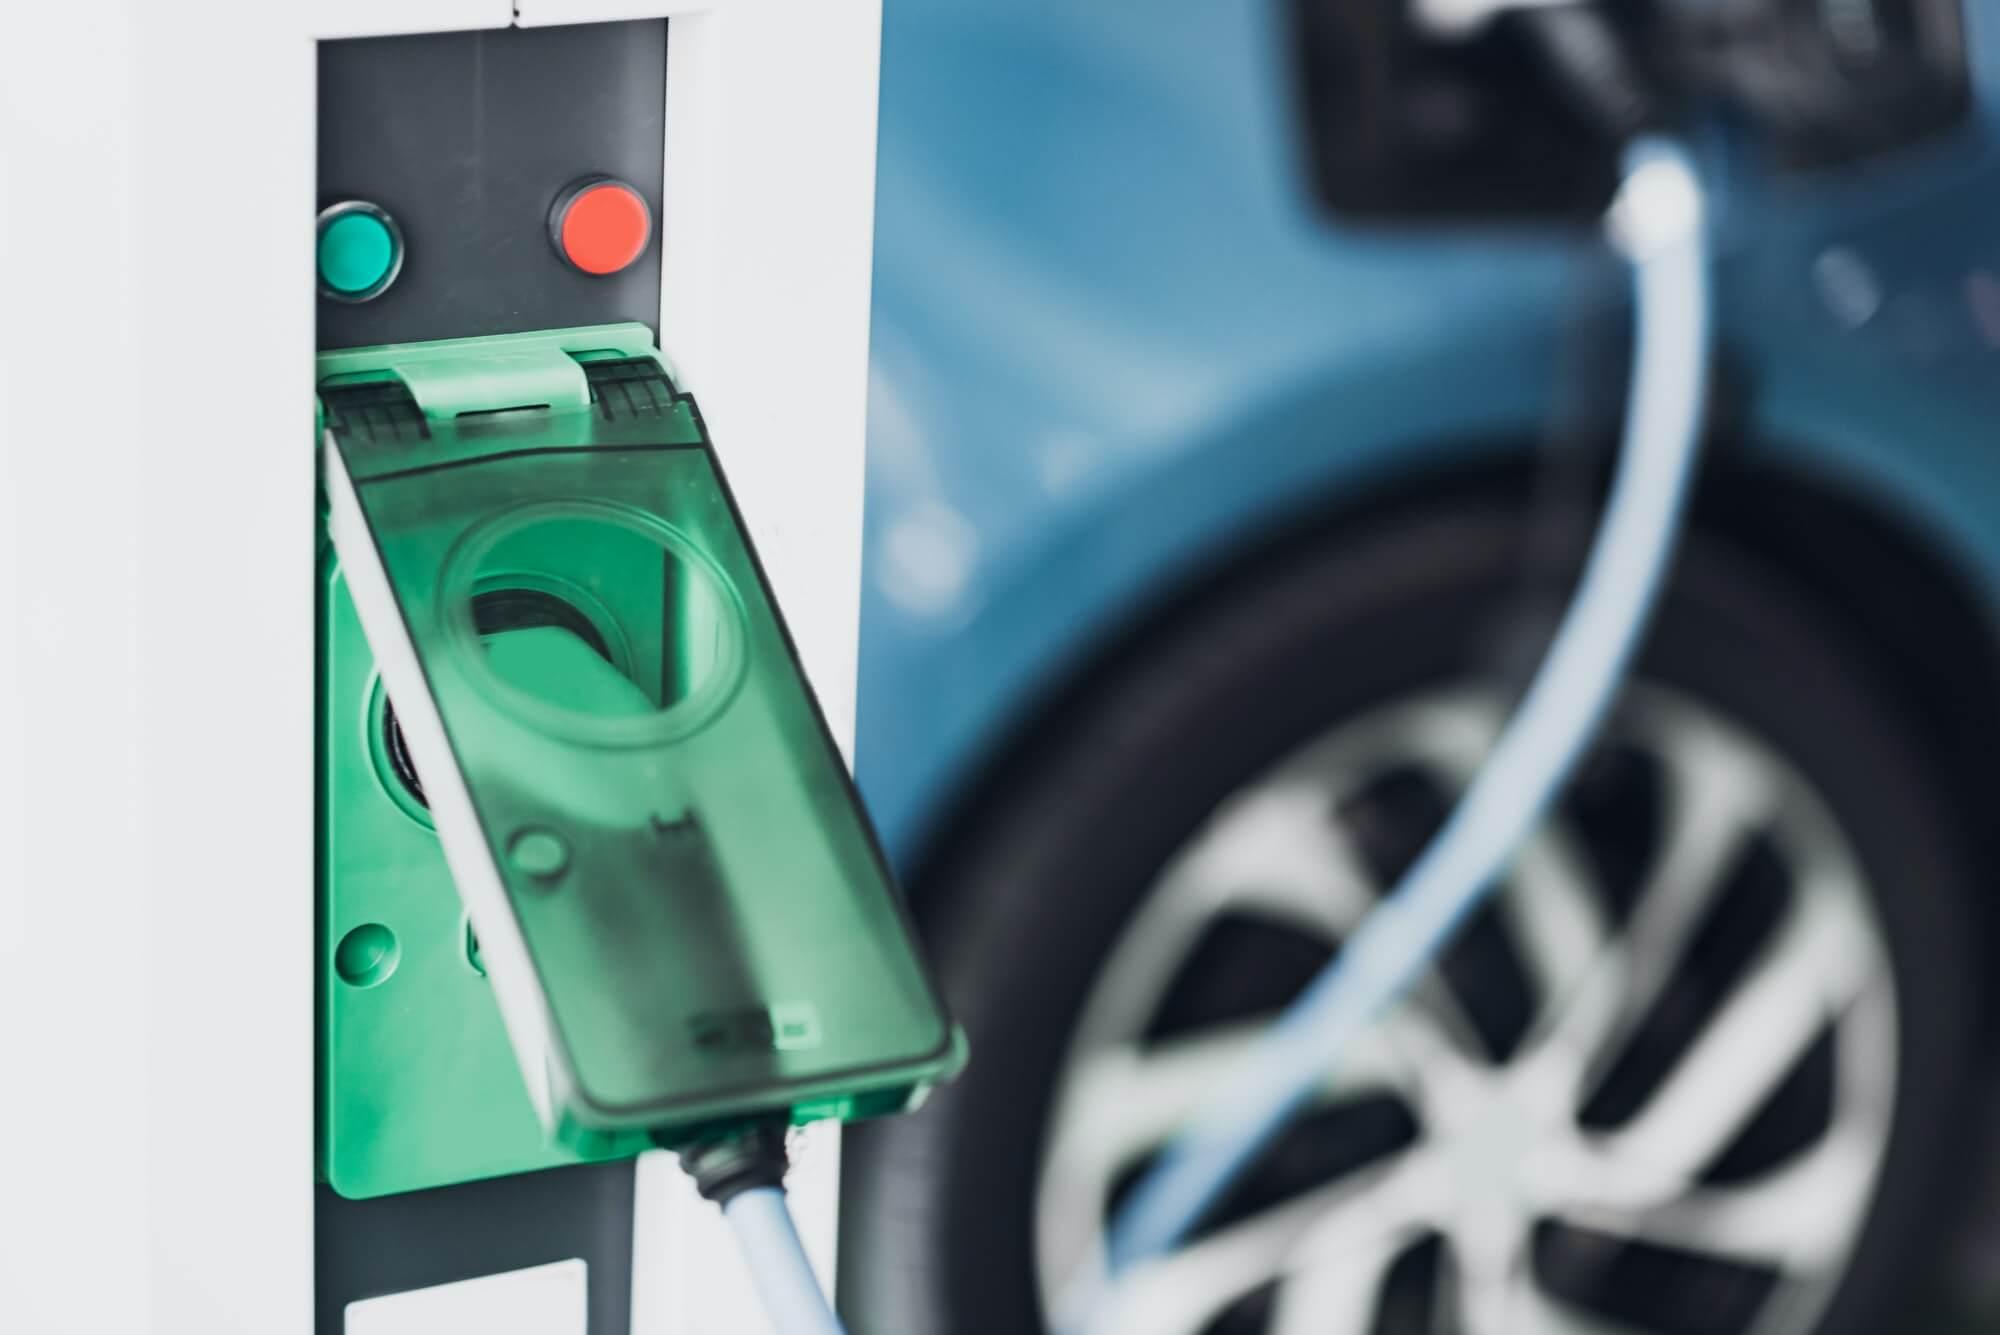 Electric vehicle charging Miljöbil hybridbil gasbil 620